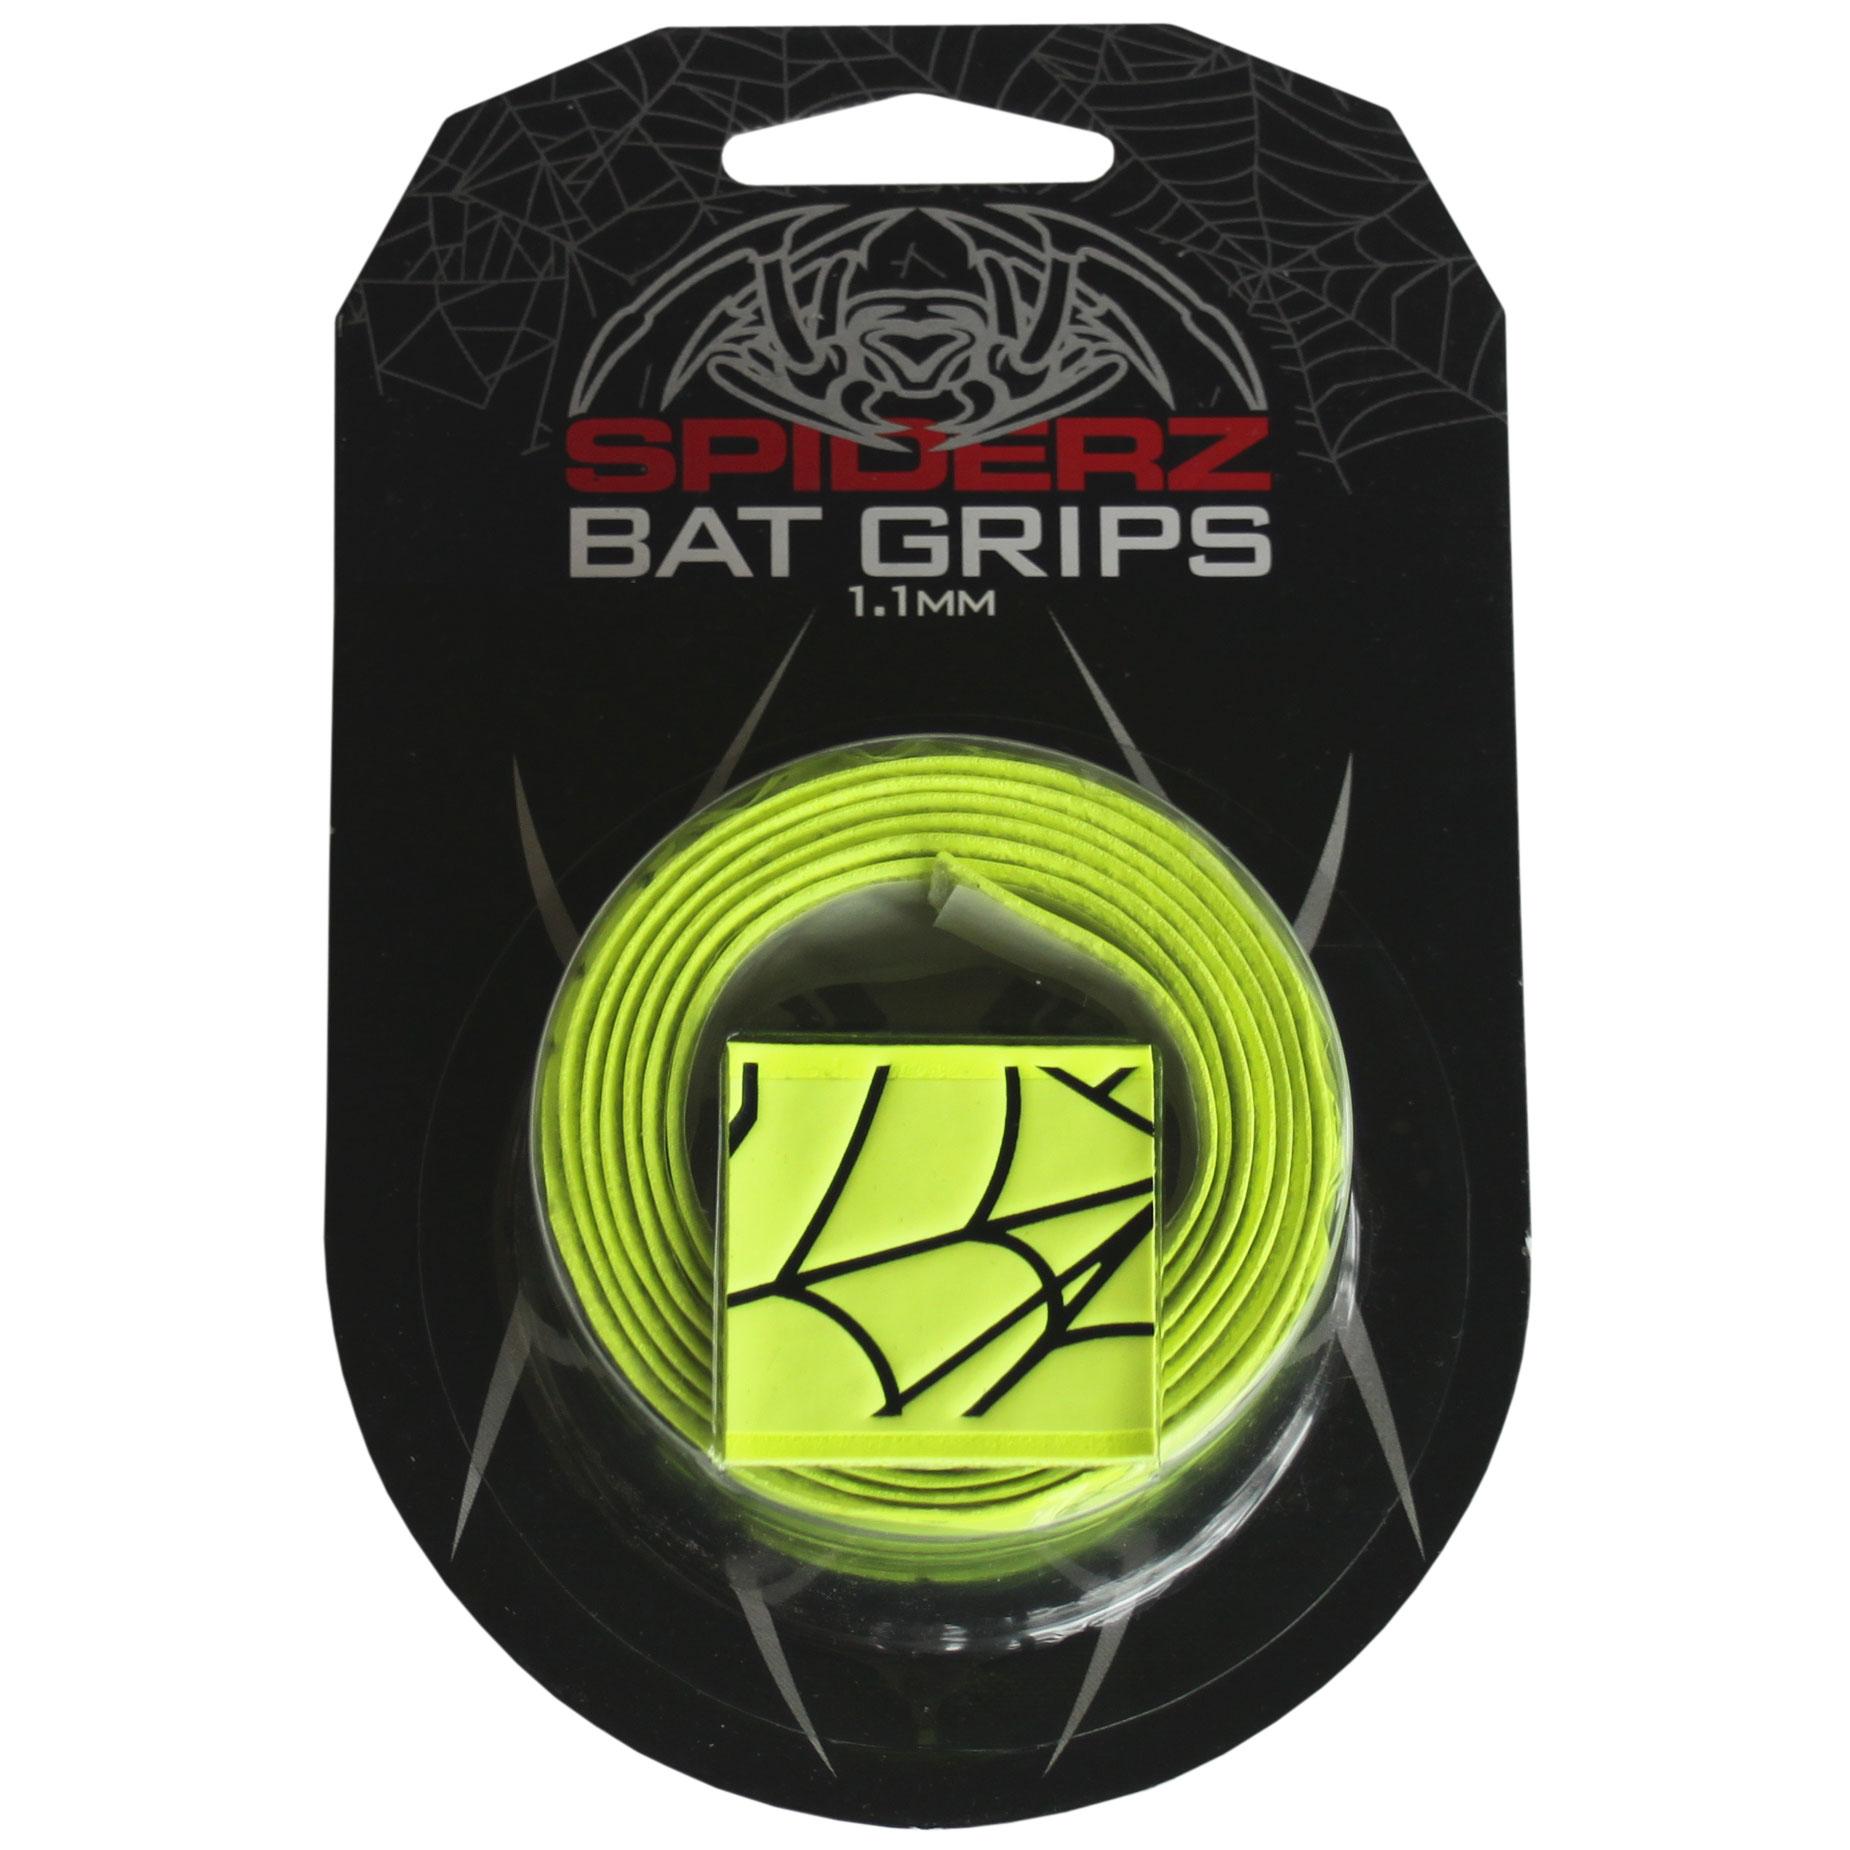 Spiderz 1.1mm Baseball/Softball Bat Grip